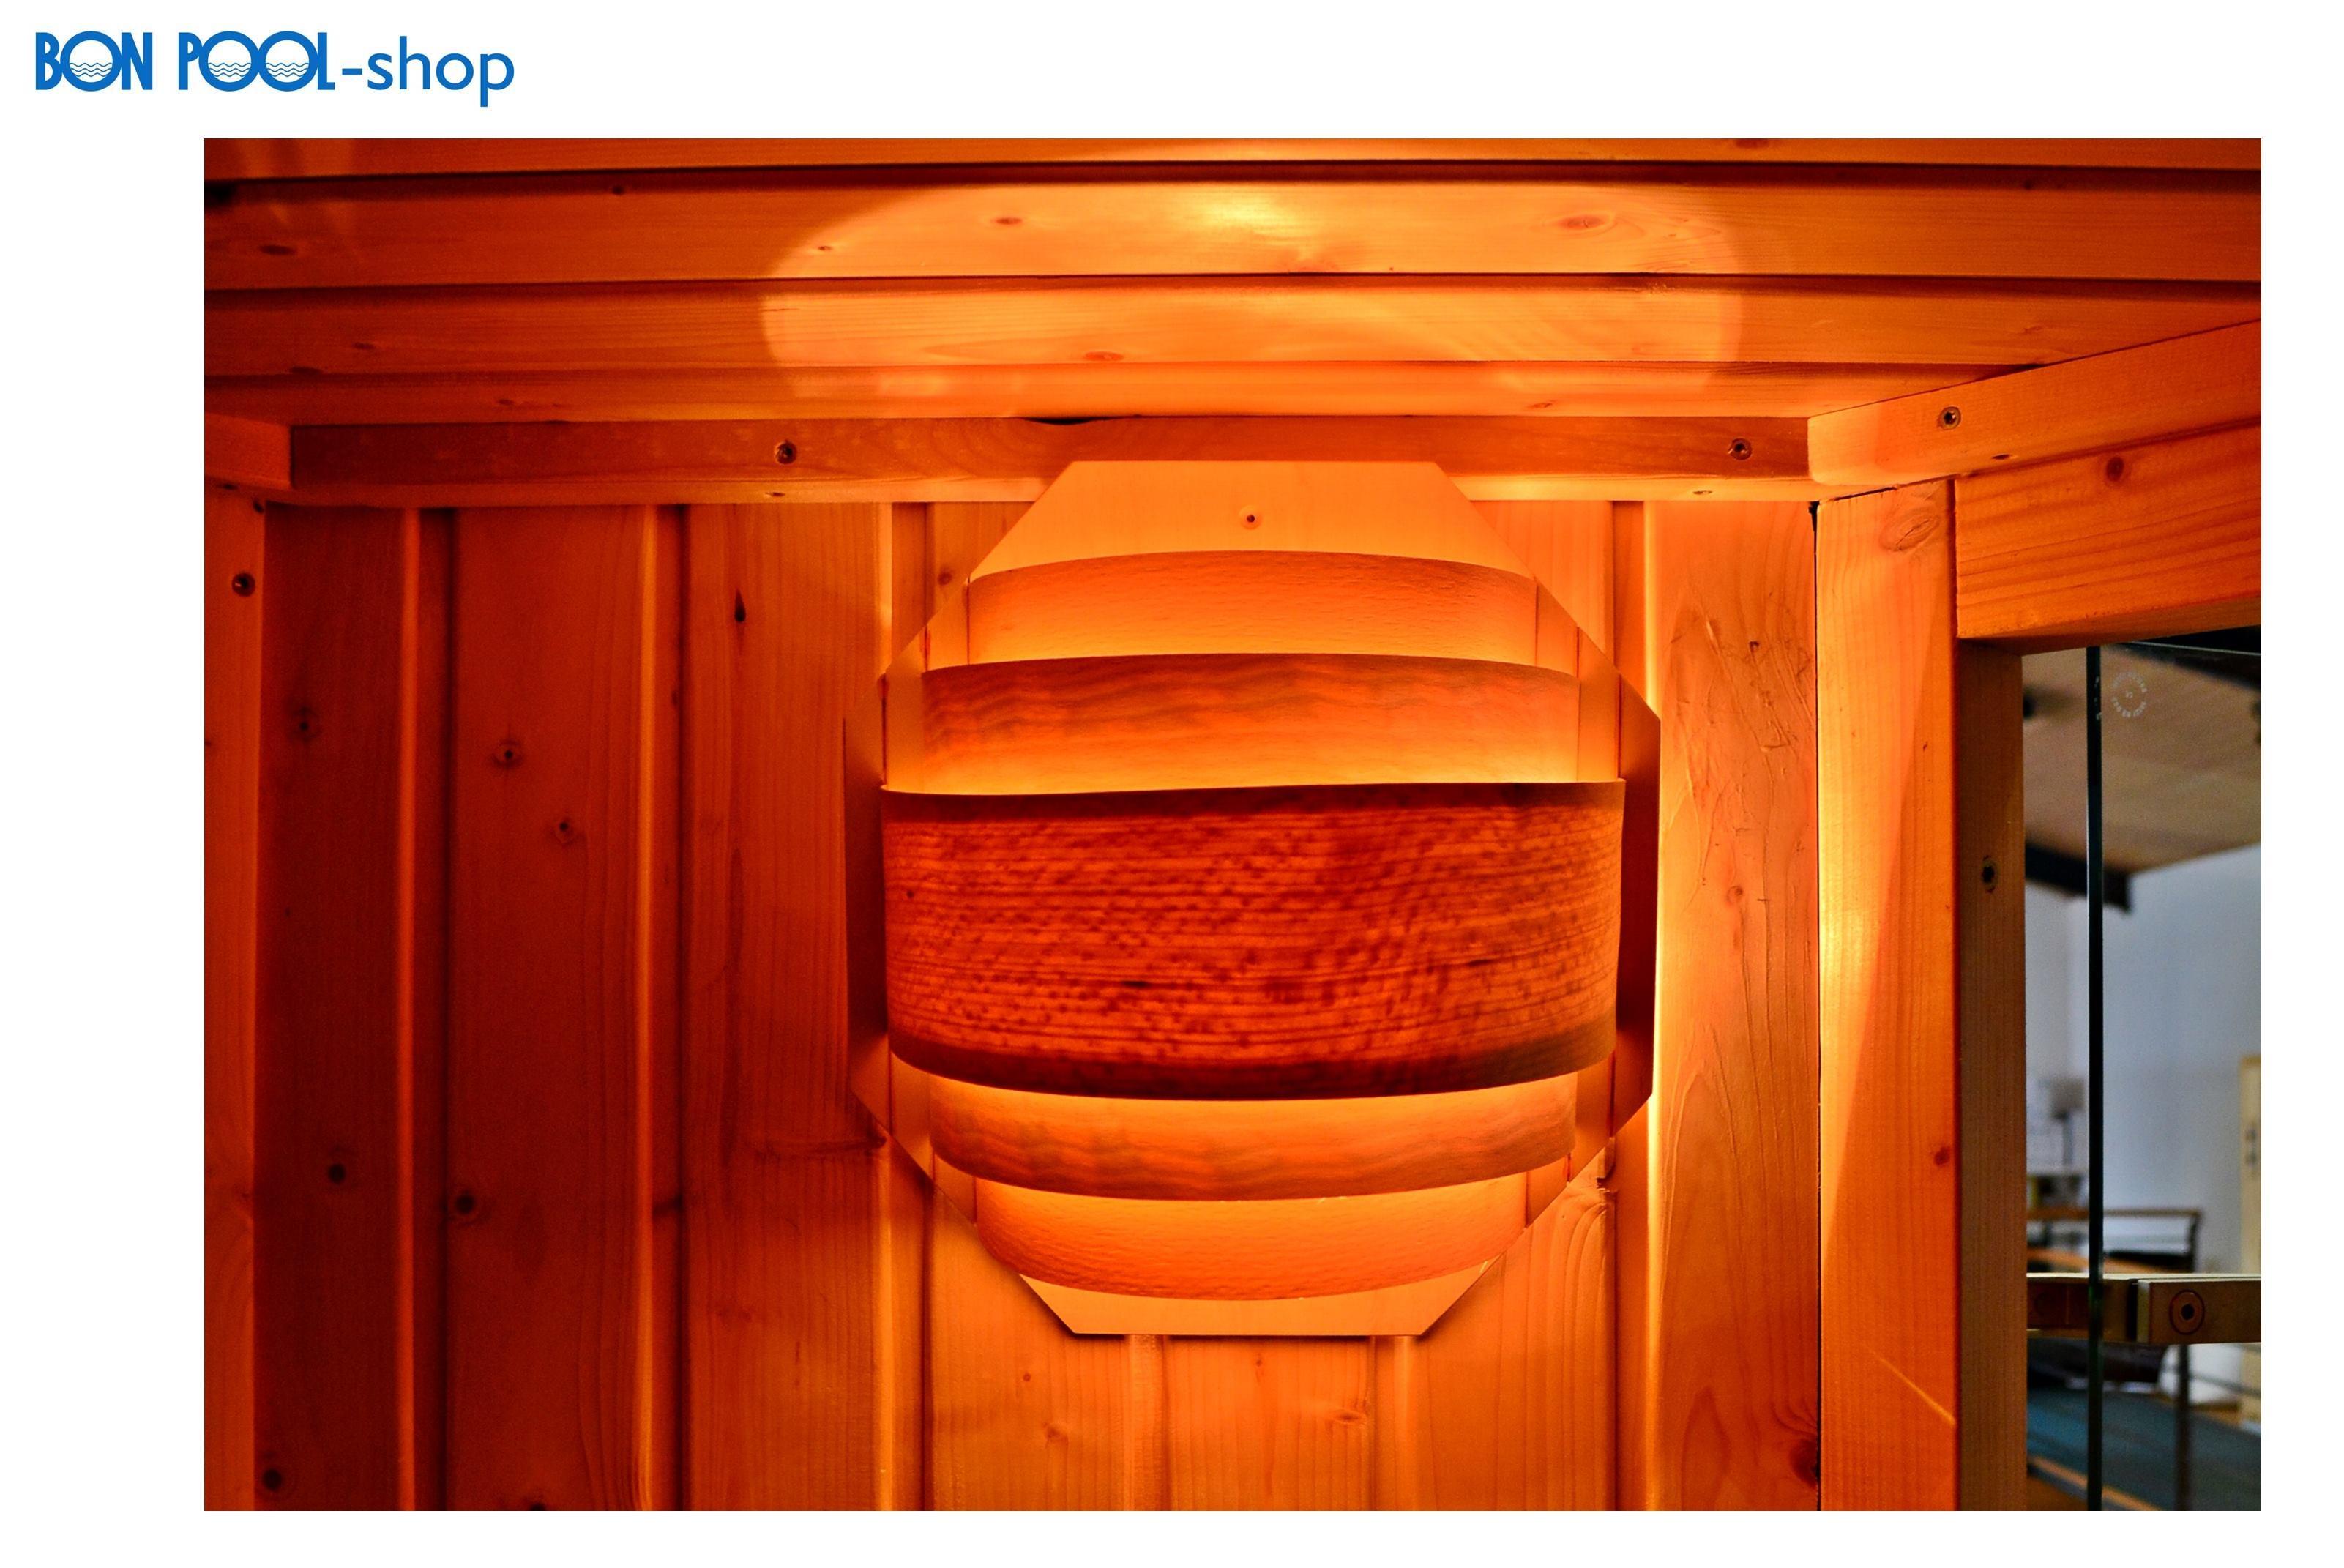 blendschirm sauna wandmontage saunalampe bon pool. Black Bedroom Furniture Sets. Home Design Ideas